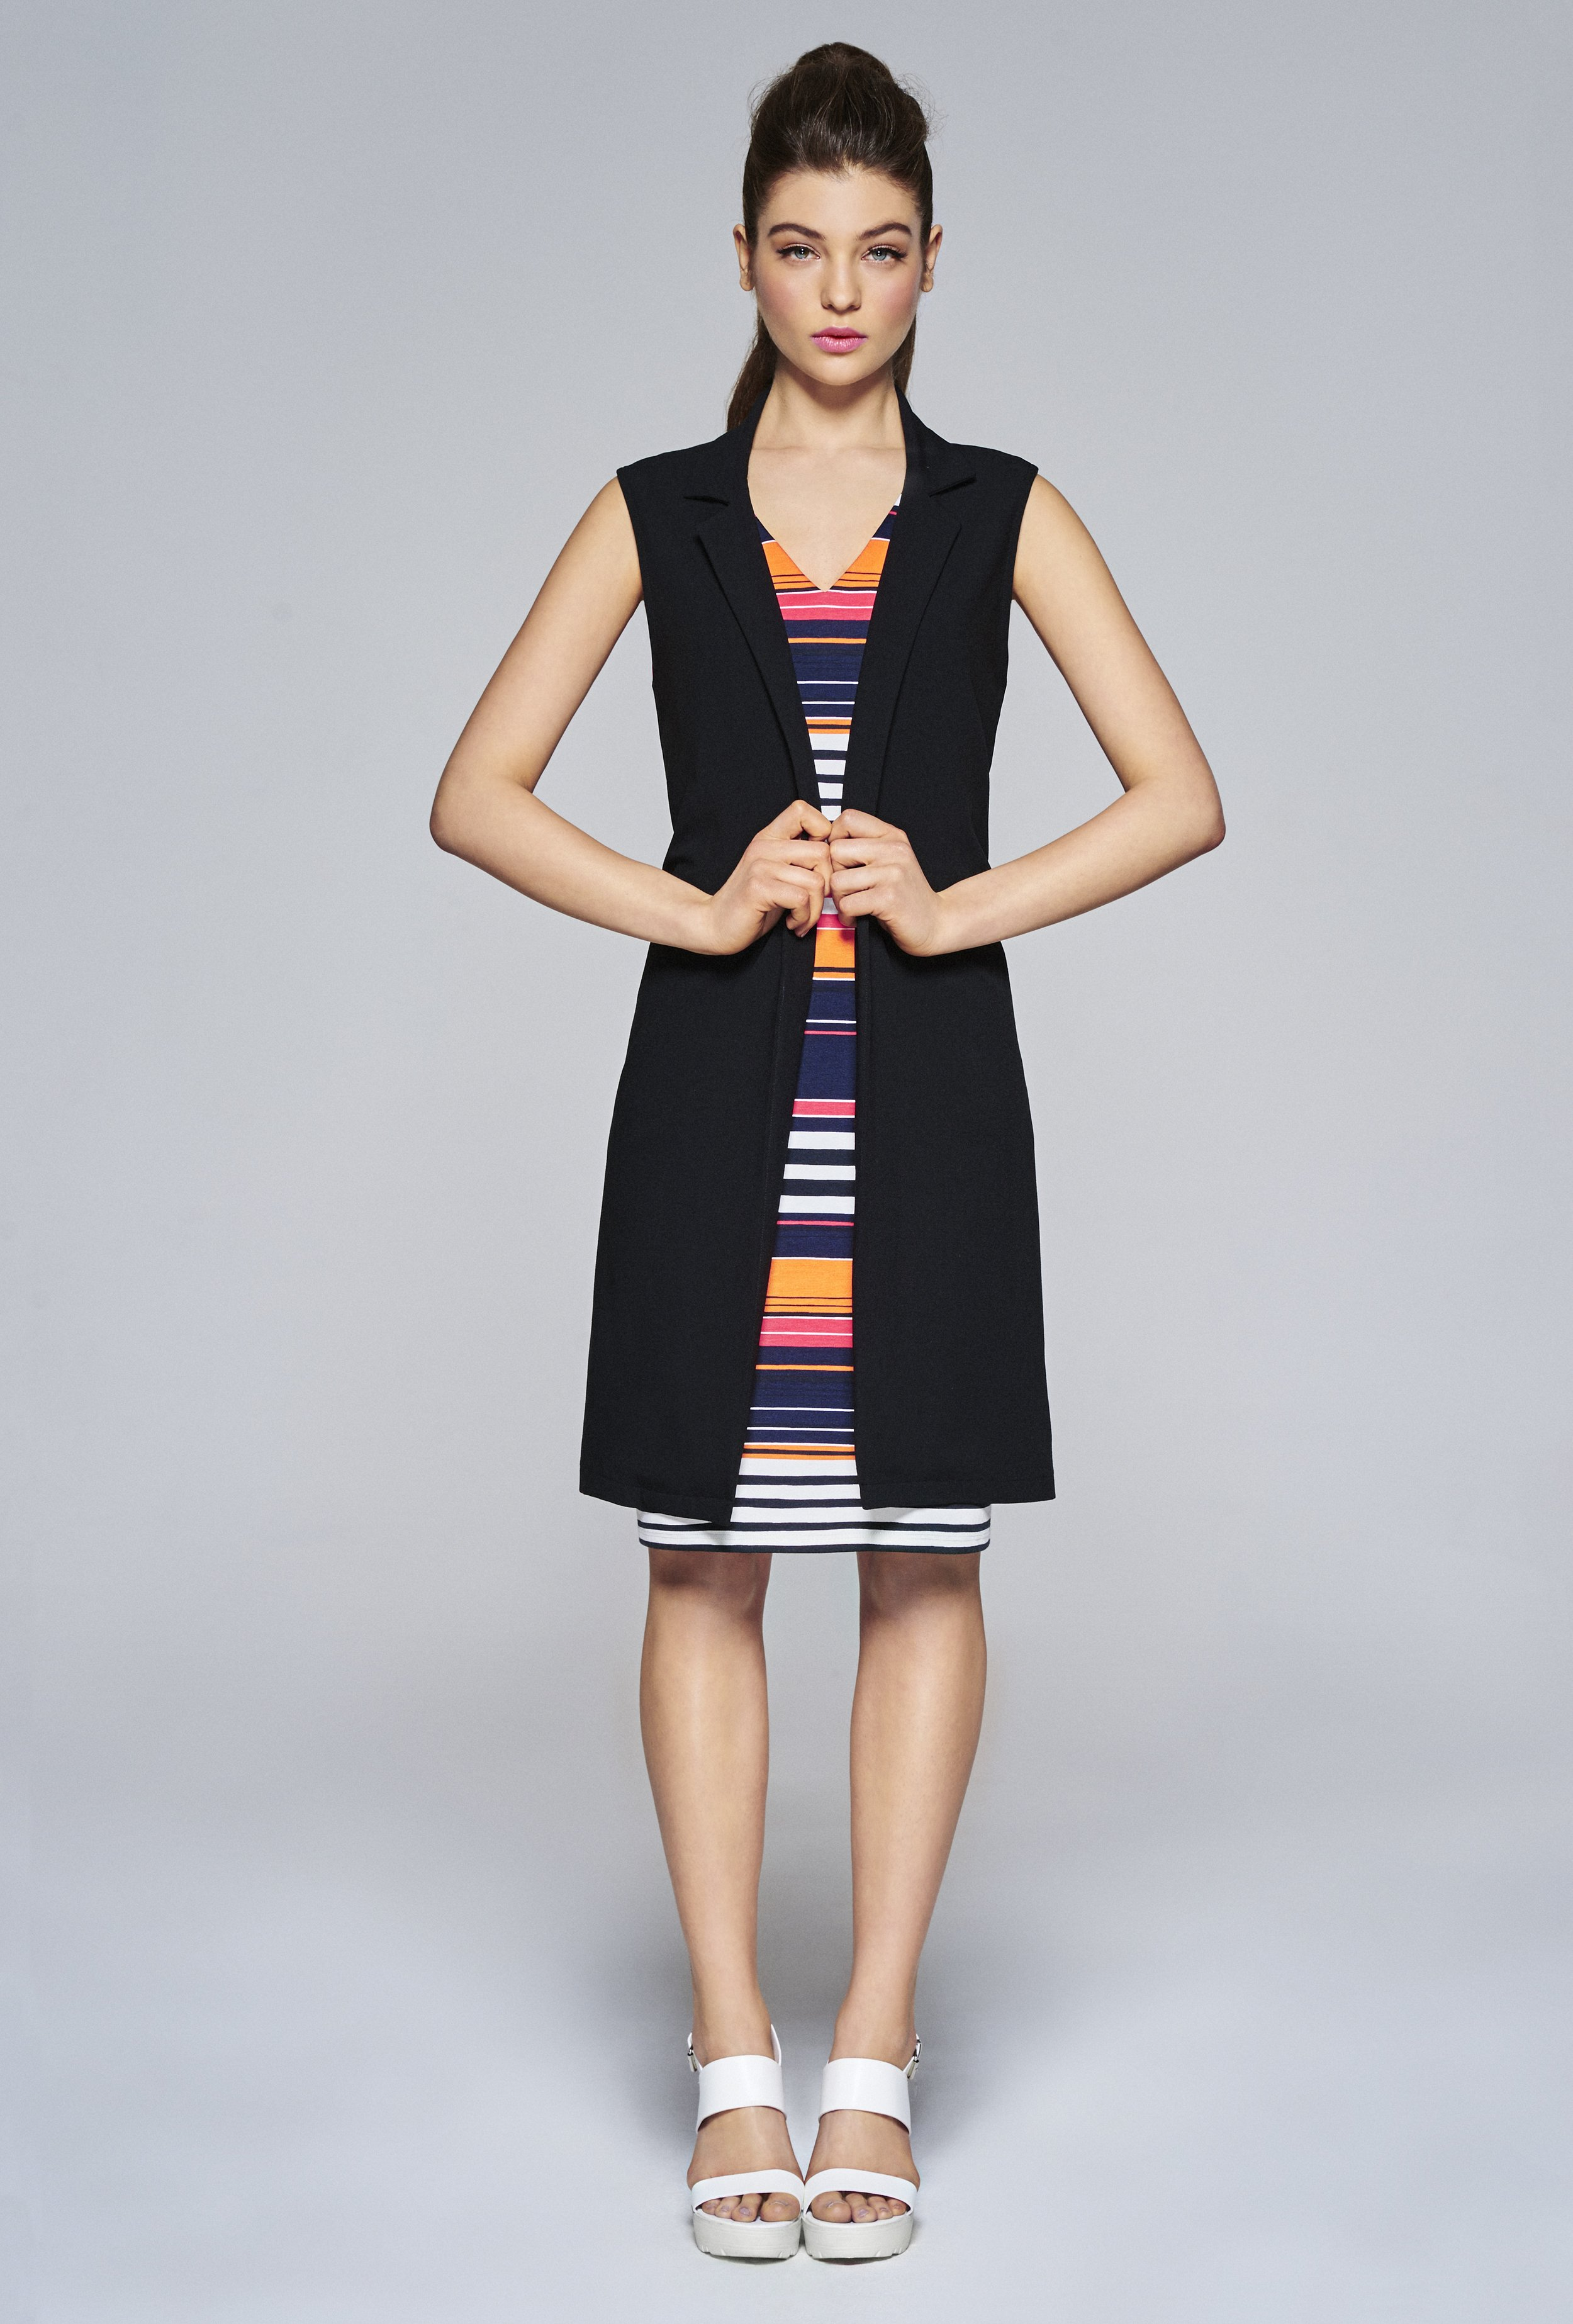 fashion-zuzmua01541.jpg